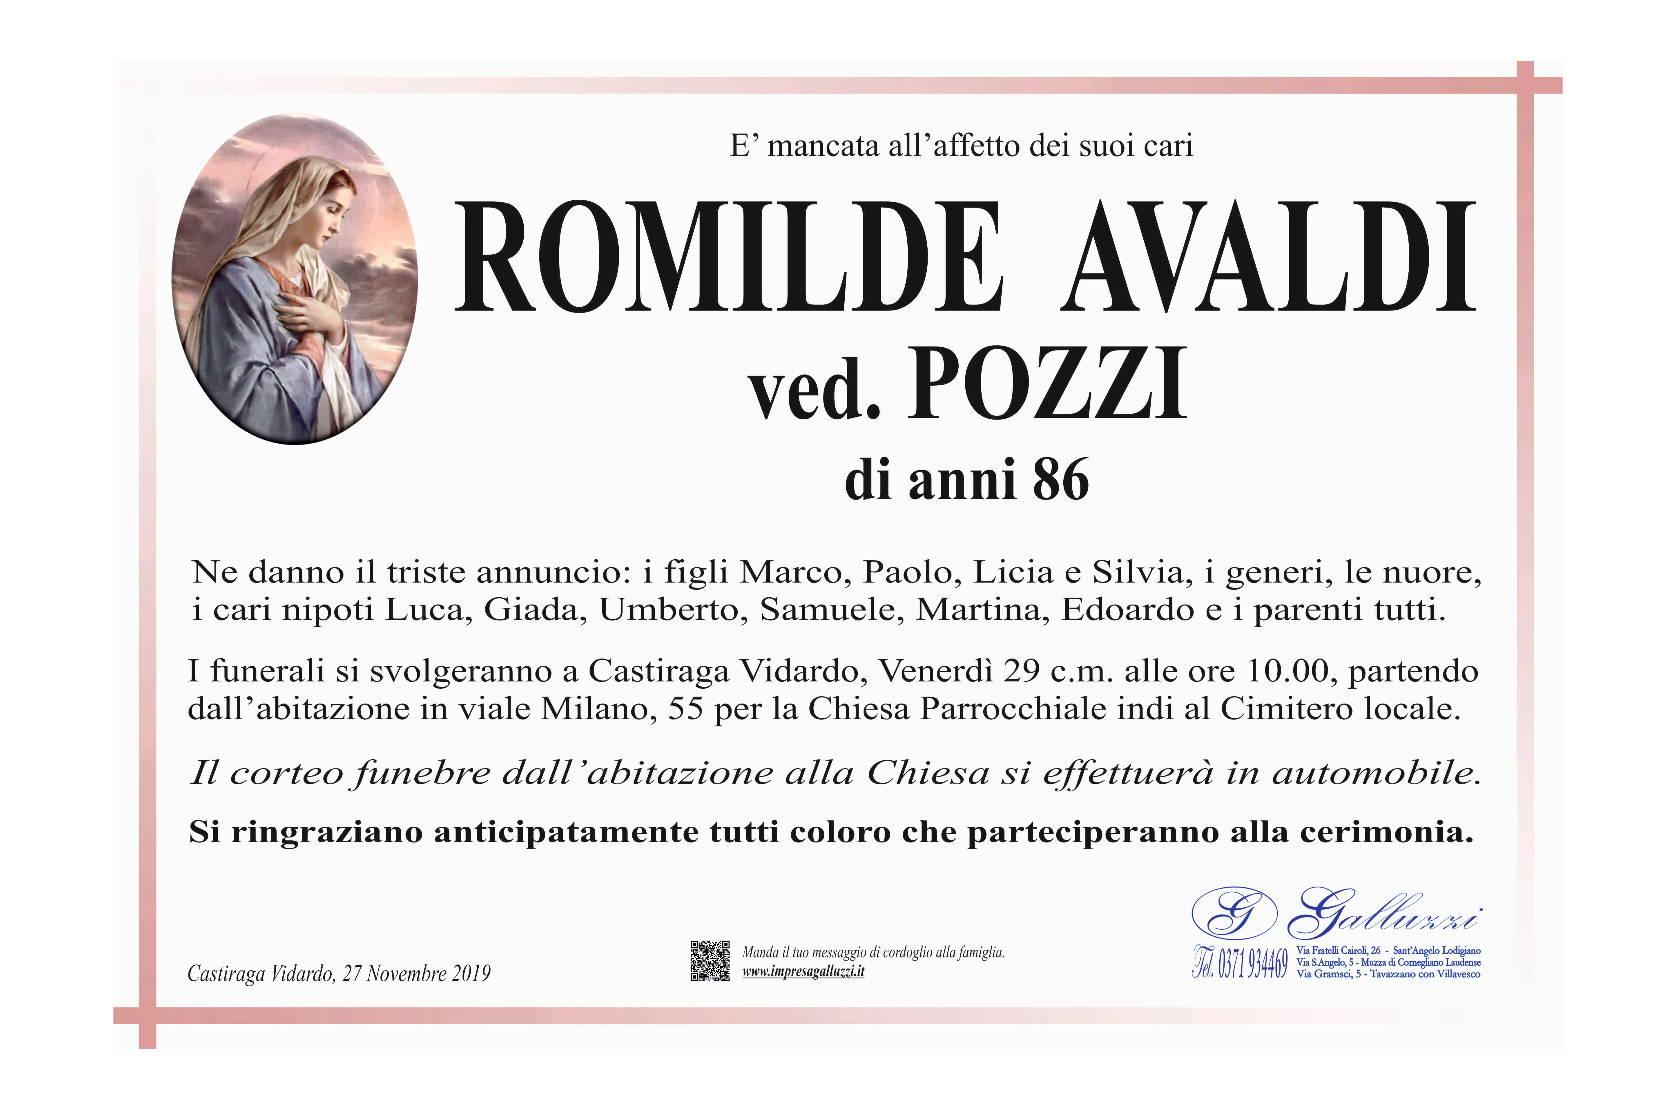 Romilde Avaldi